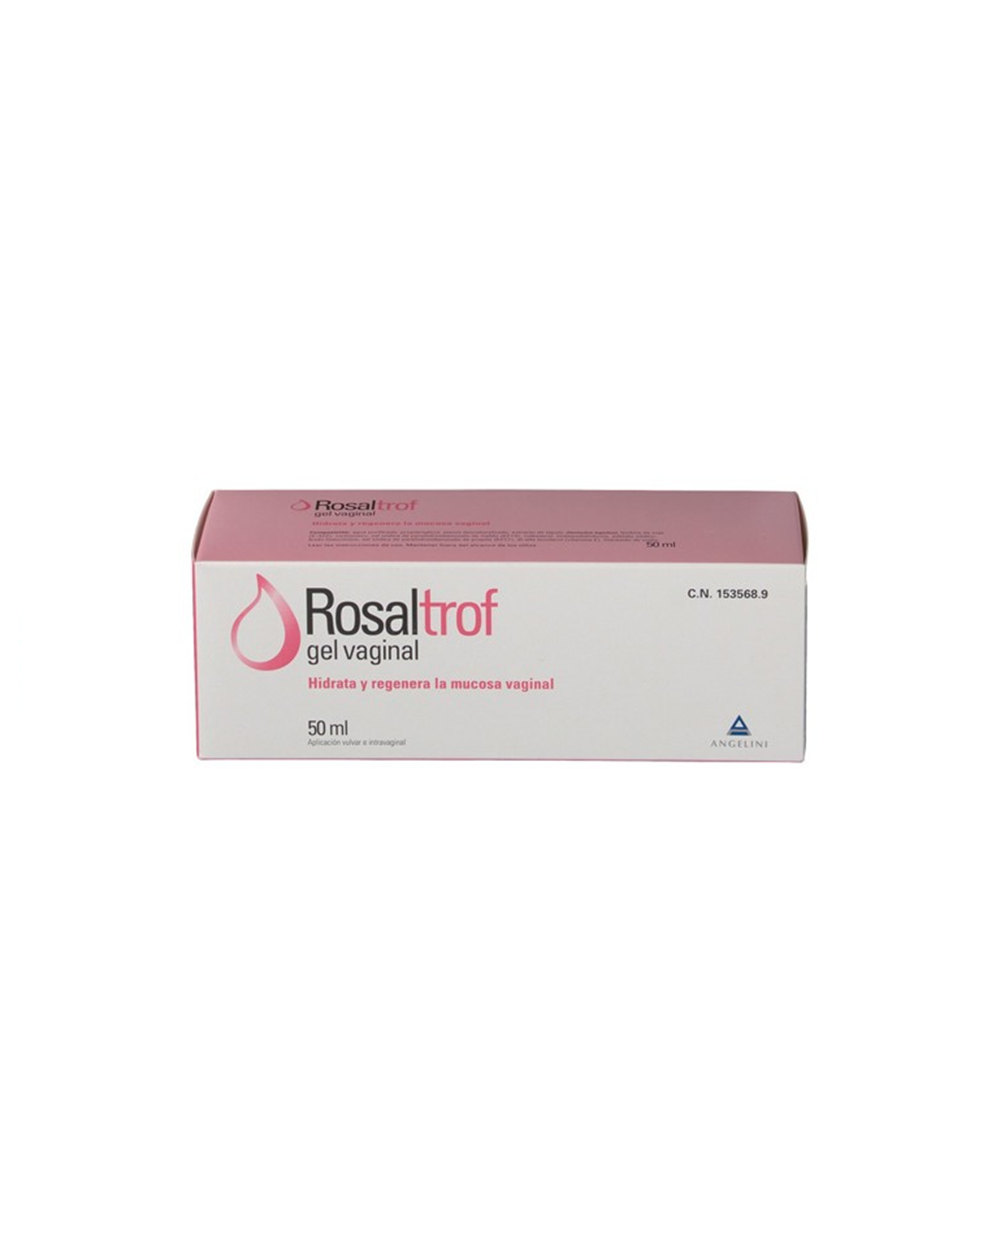 Rosaltrof - gel vaginal - 50 ml